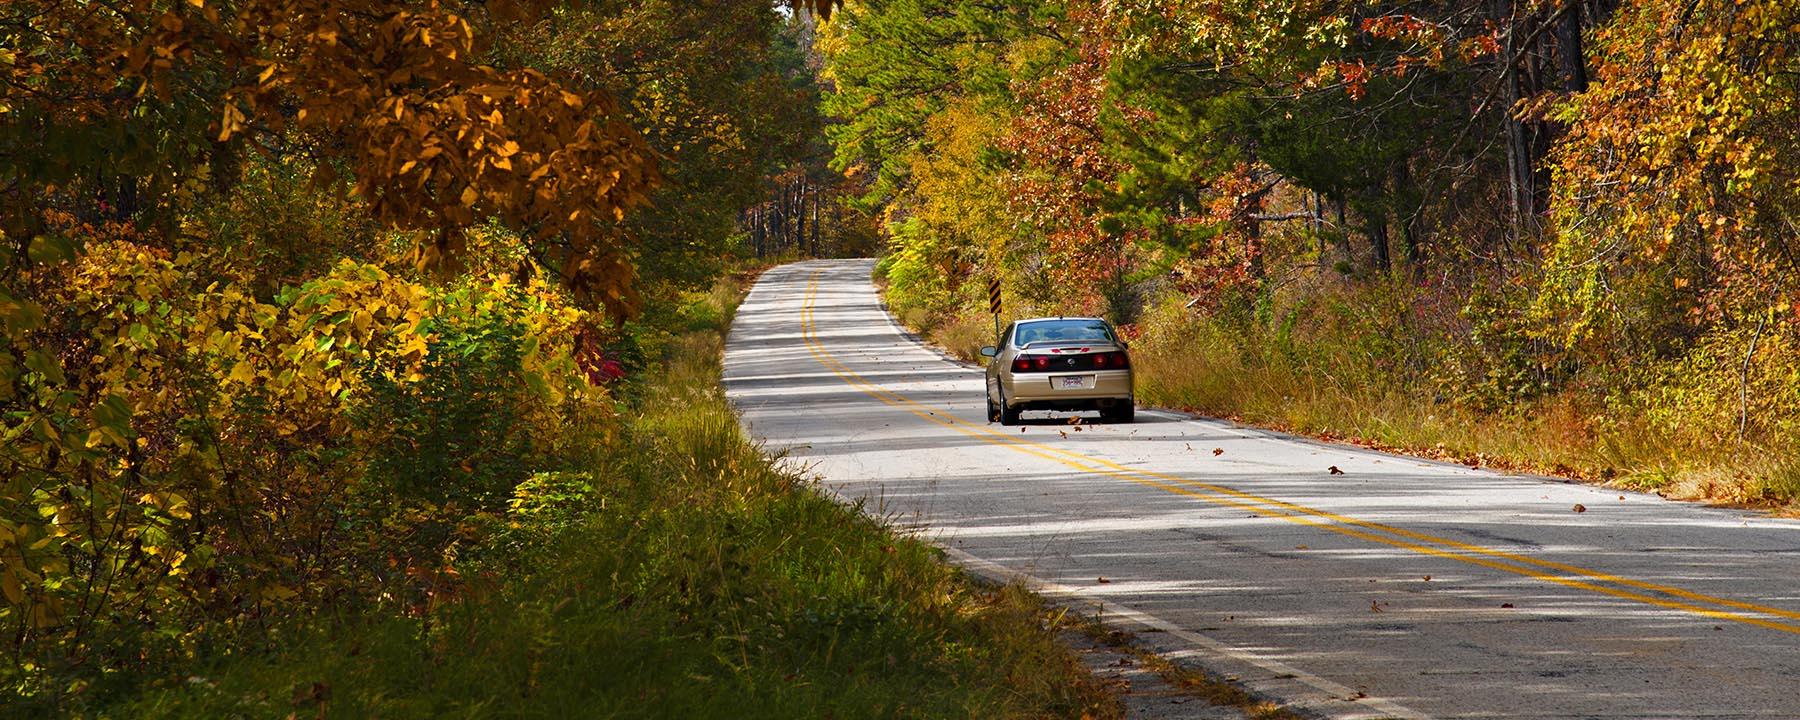 Arkansas-Good-Roads-Foundation-Slider-Image-8